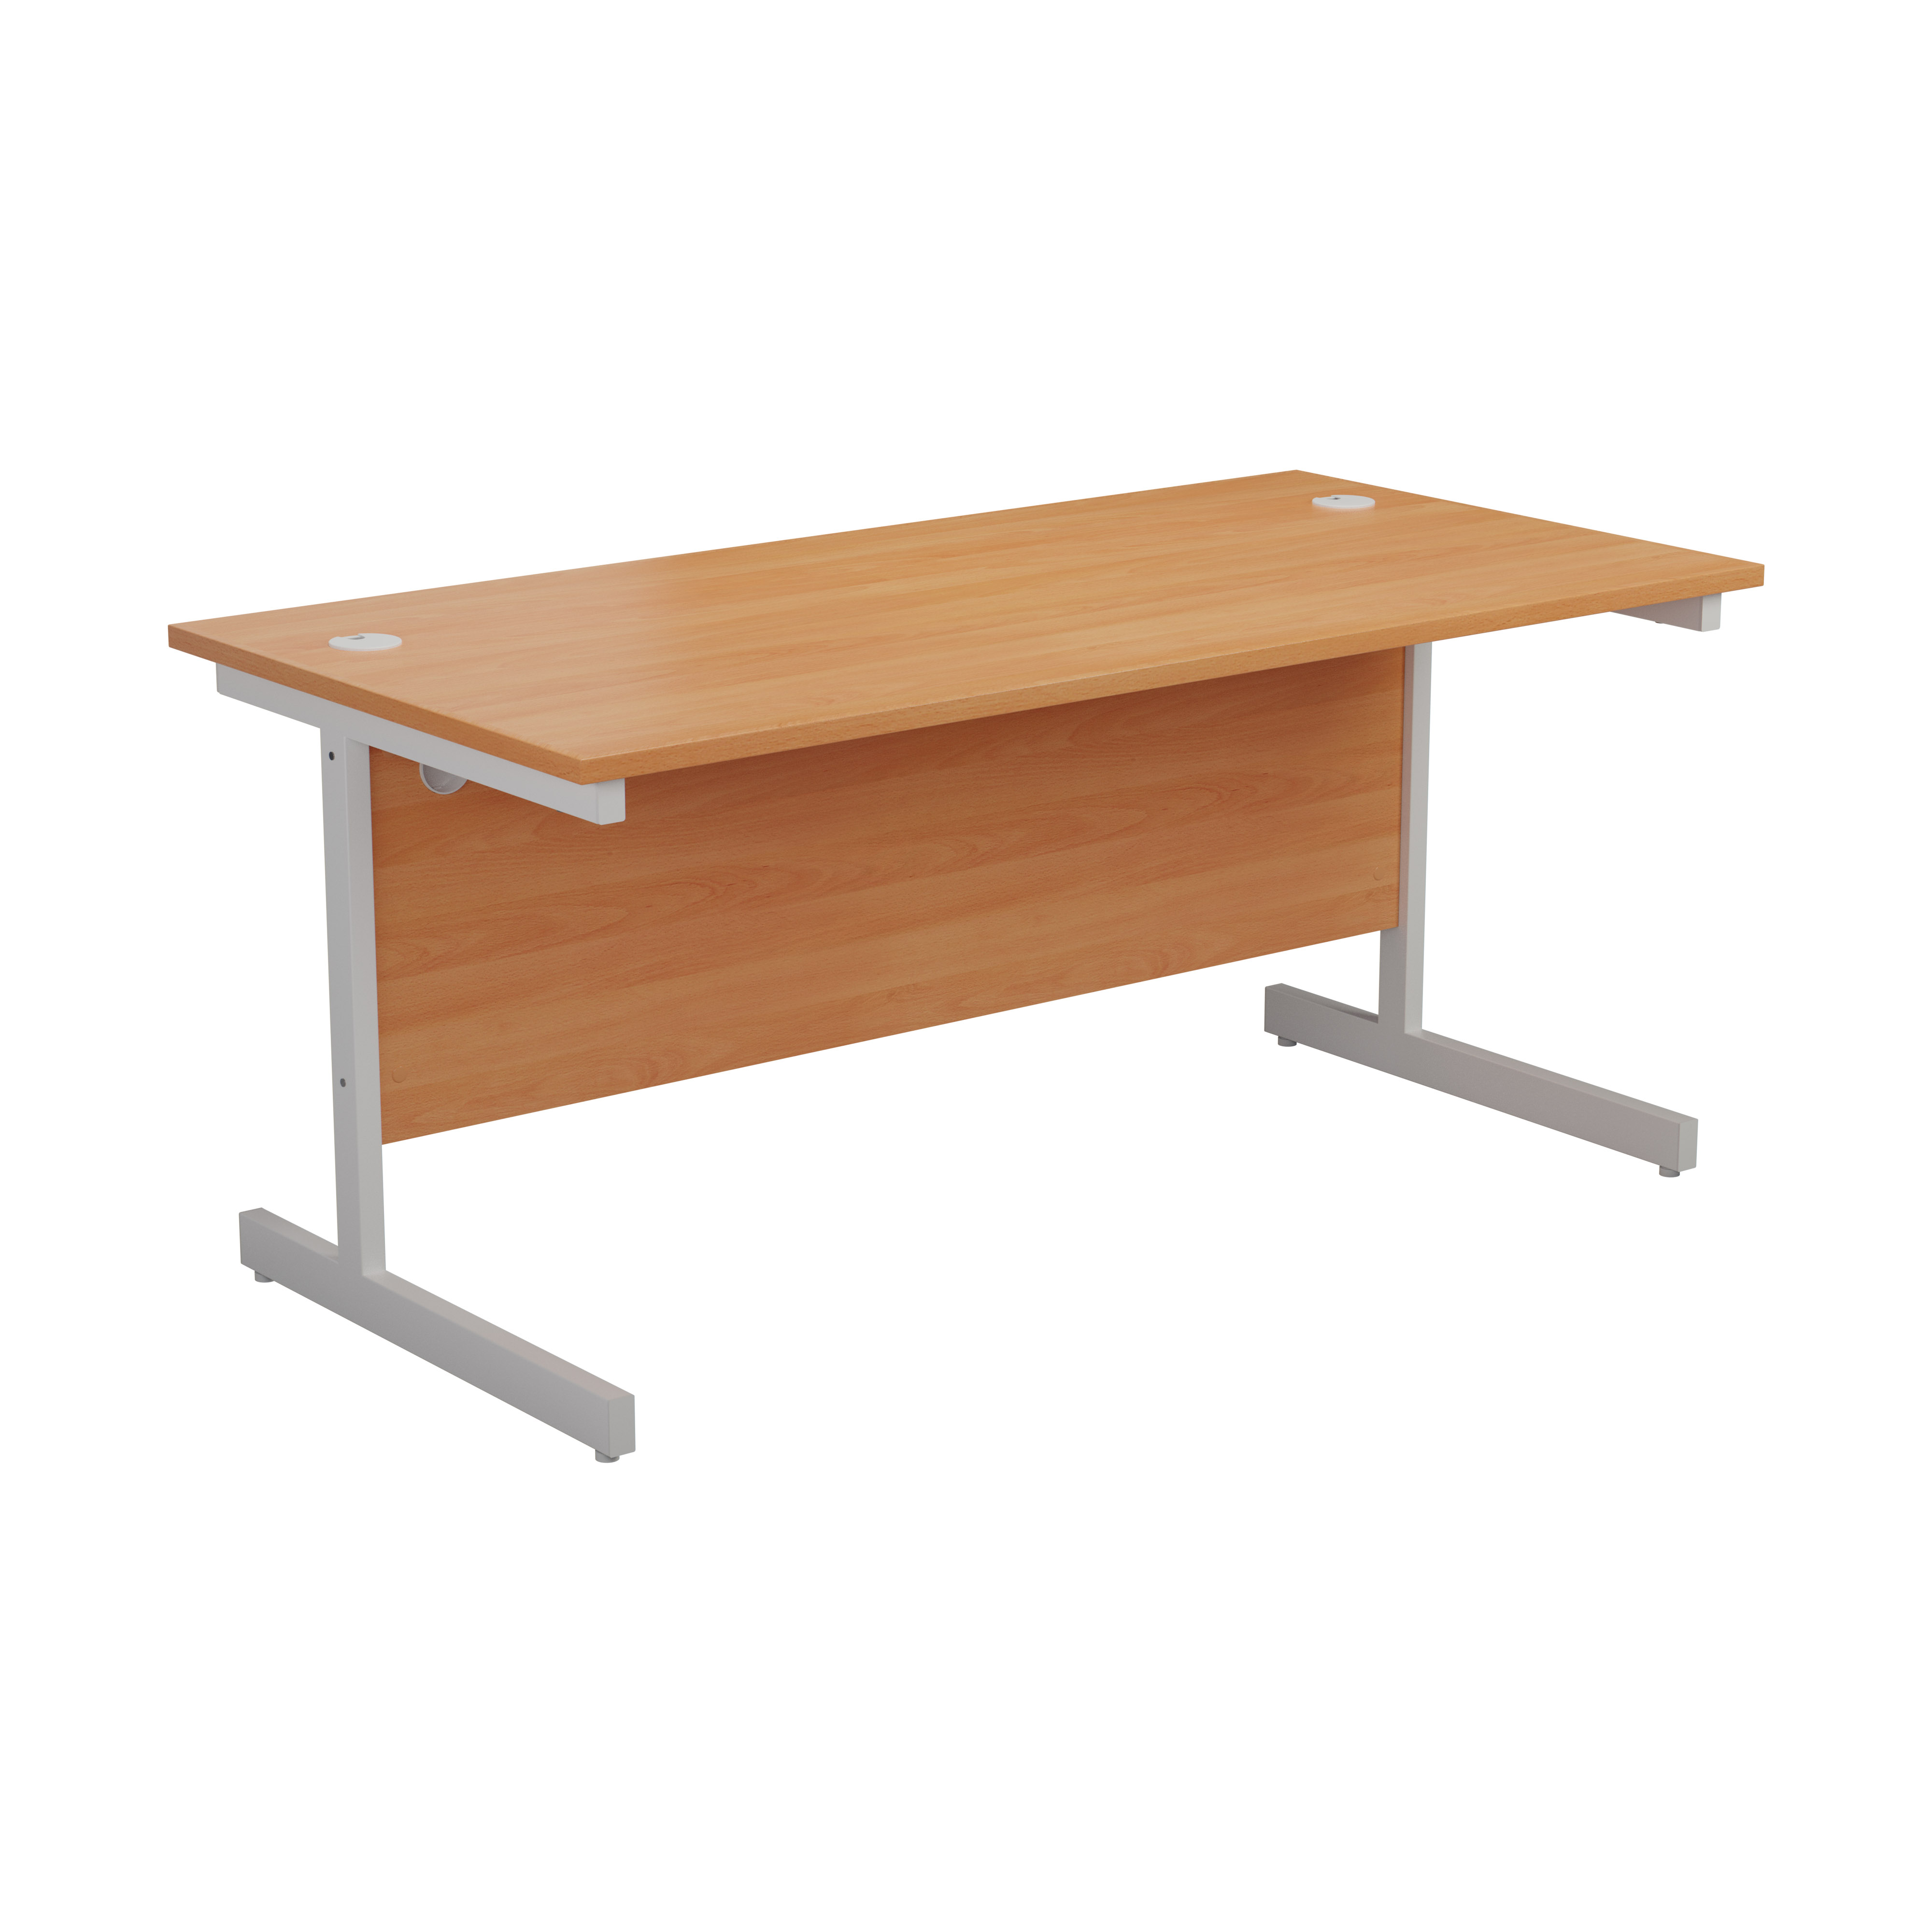 Essentials - 1800mm Rectangular Desk